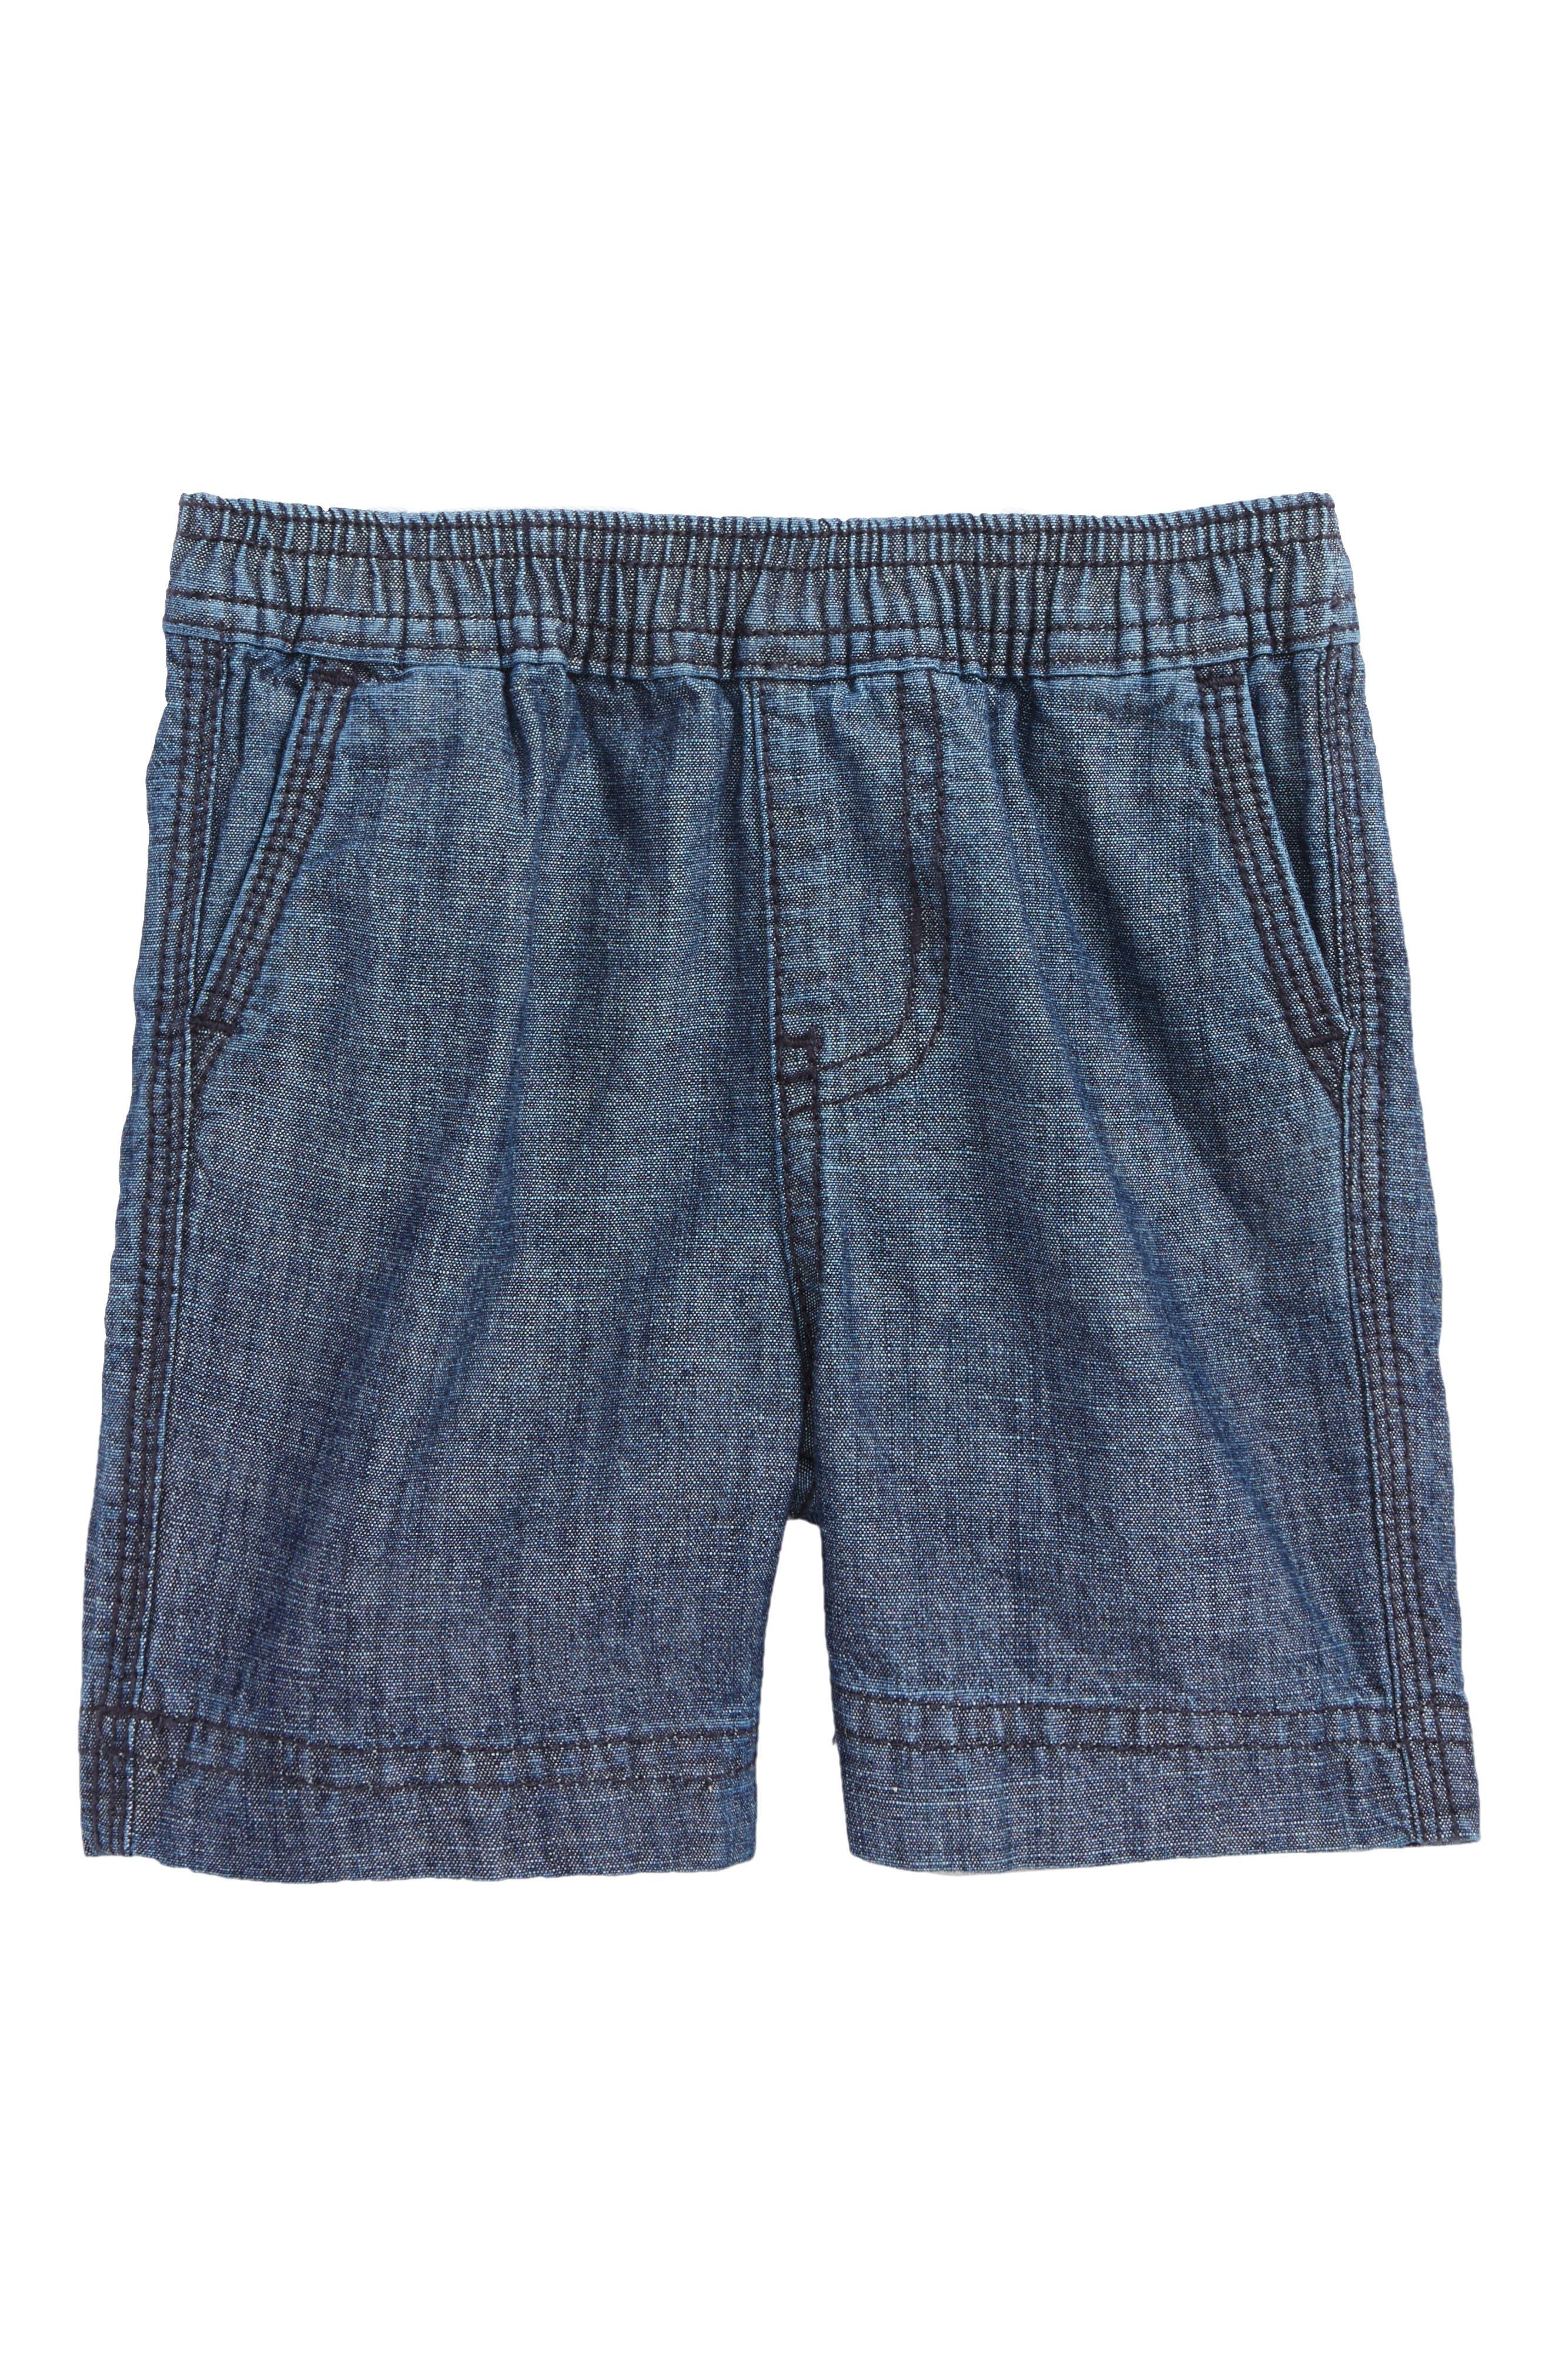 Easy Does It Chambray Shorts,                             Main thumbnail 1, color,                             410